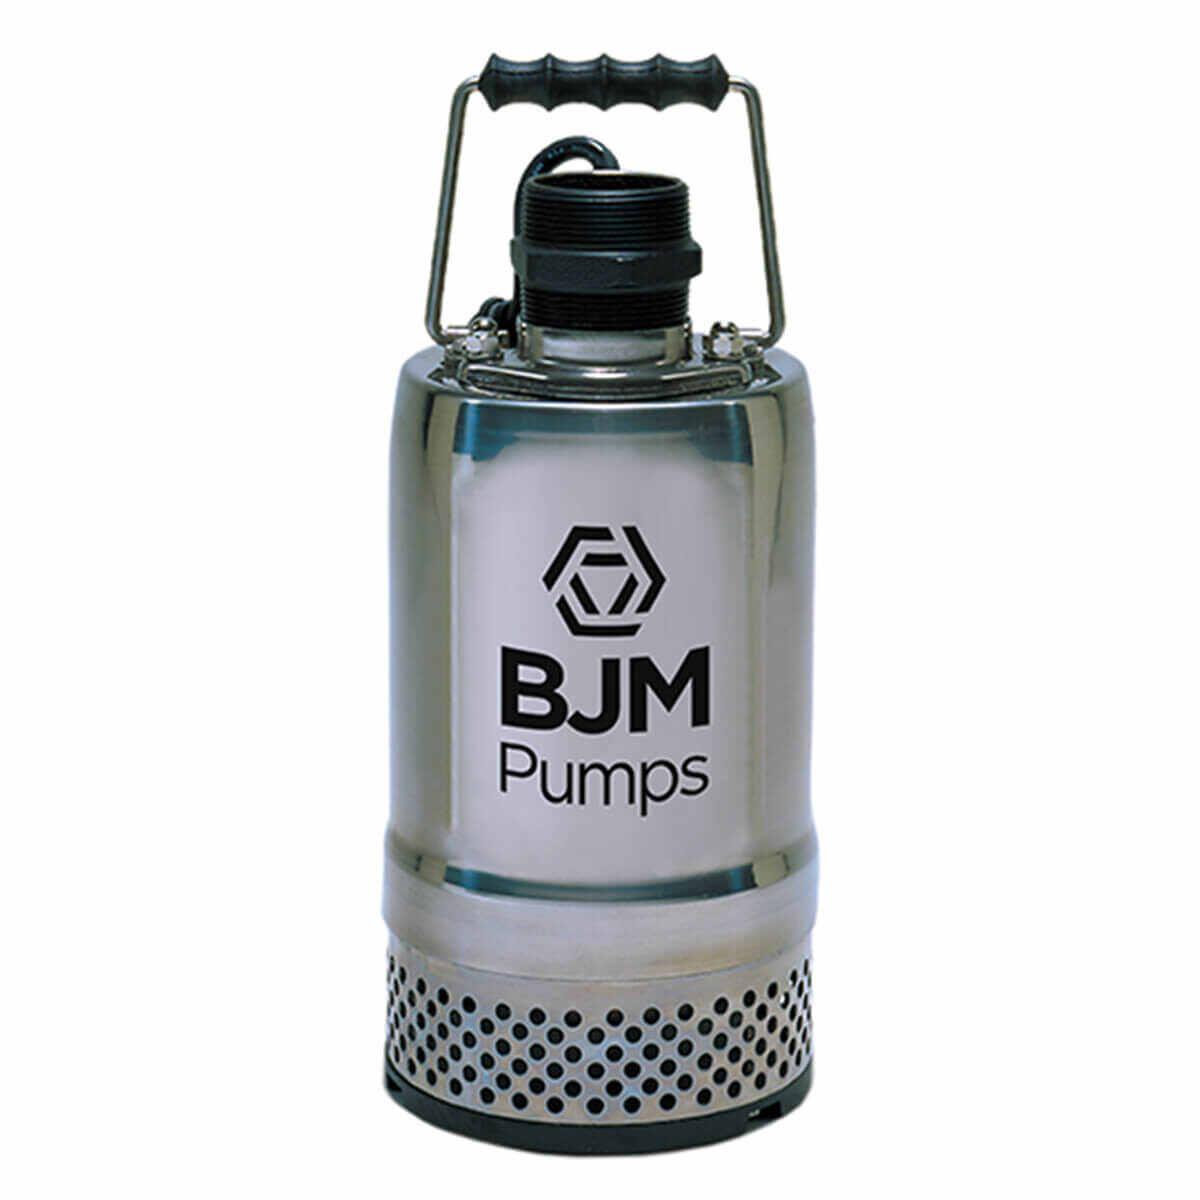 BJM R250-115V Dewatering Pump